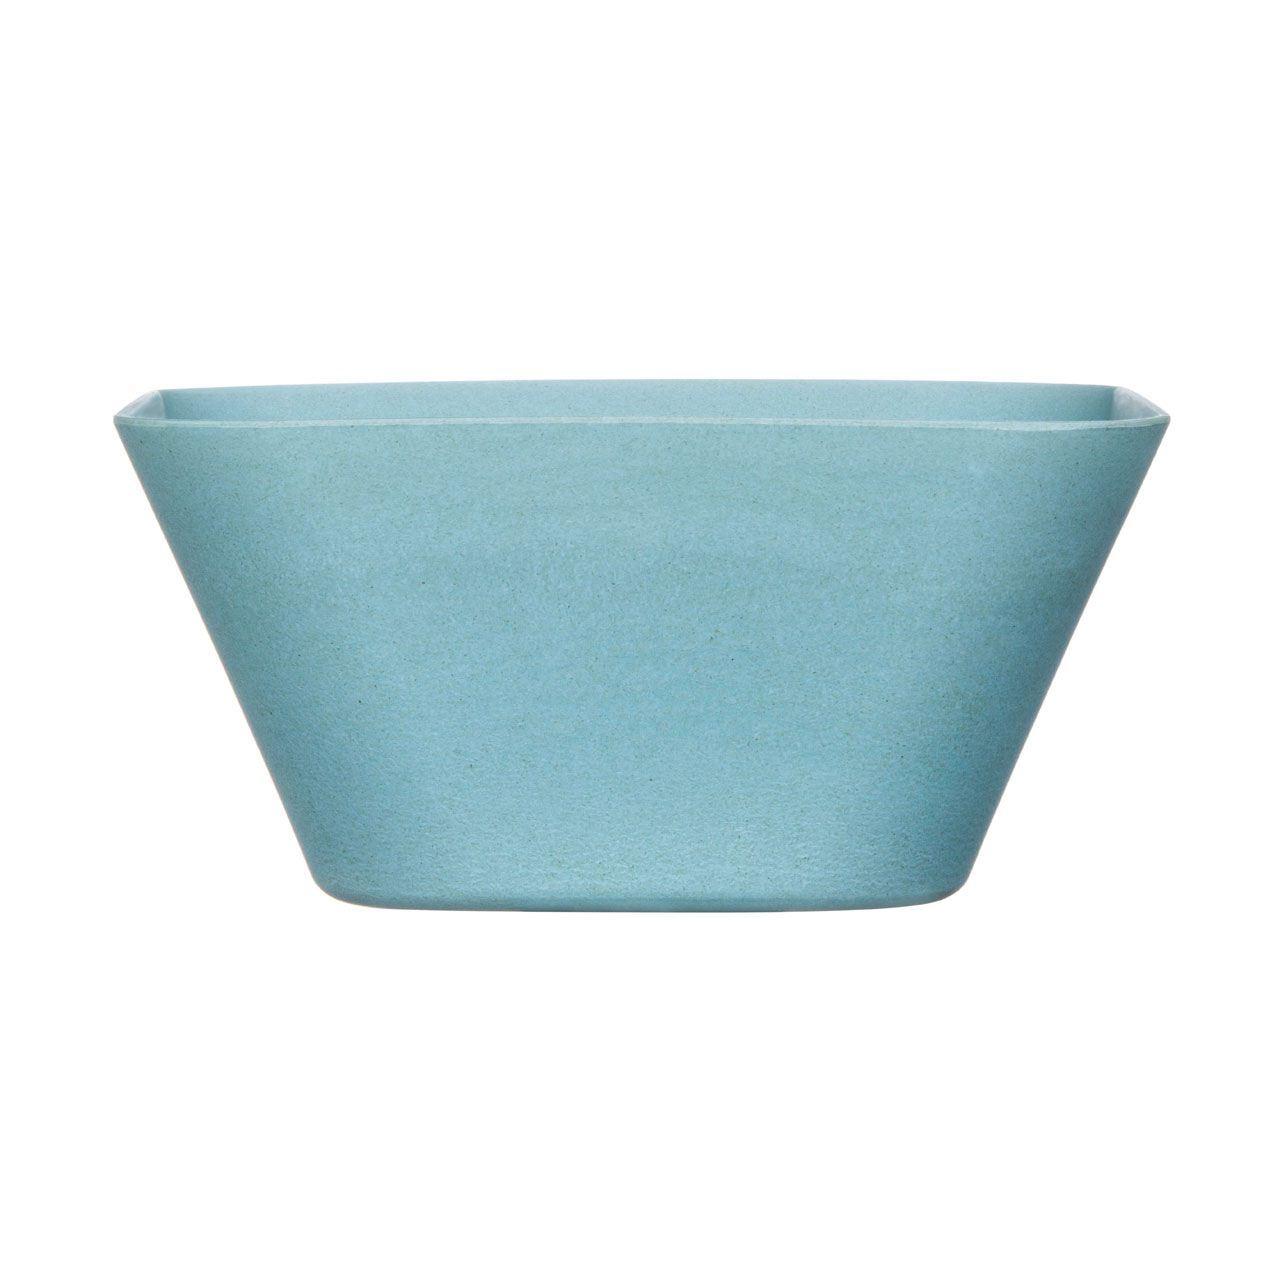 Premier Houswares Eden Dinner Plate Blue Bamboo Fibre